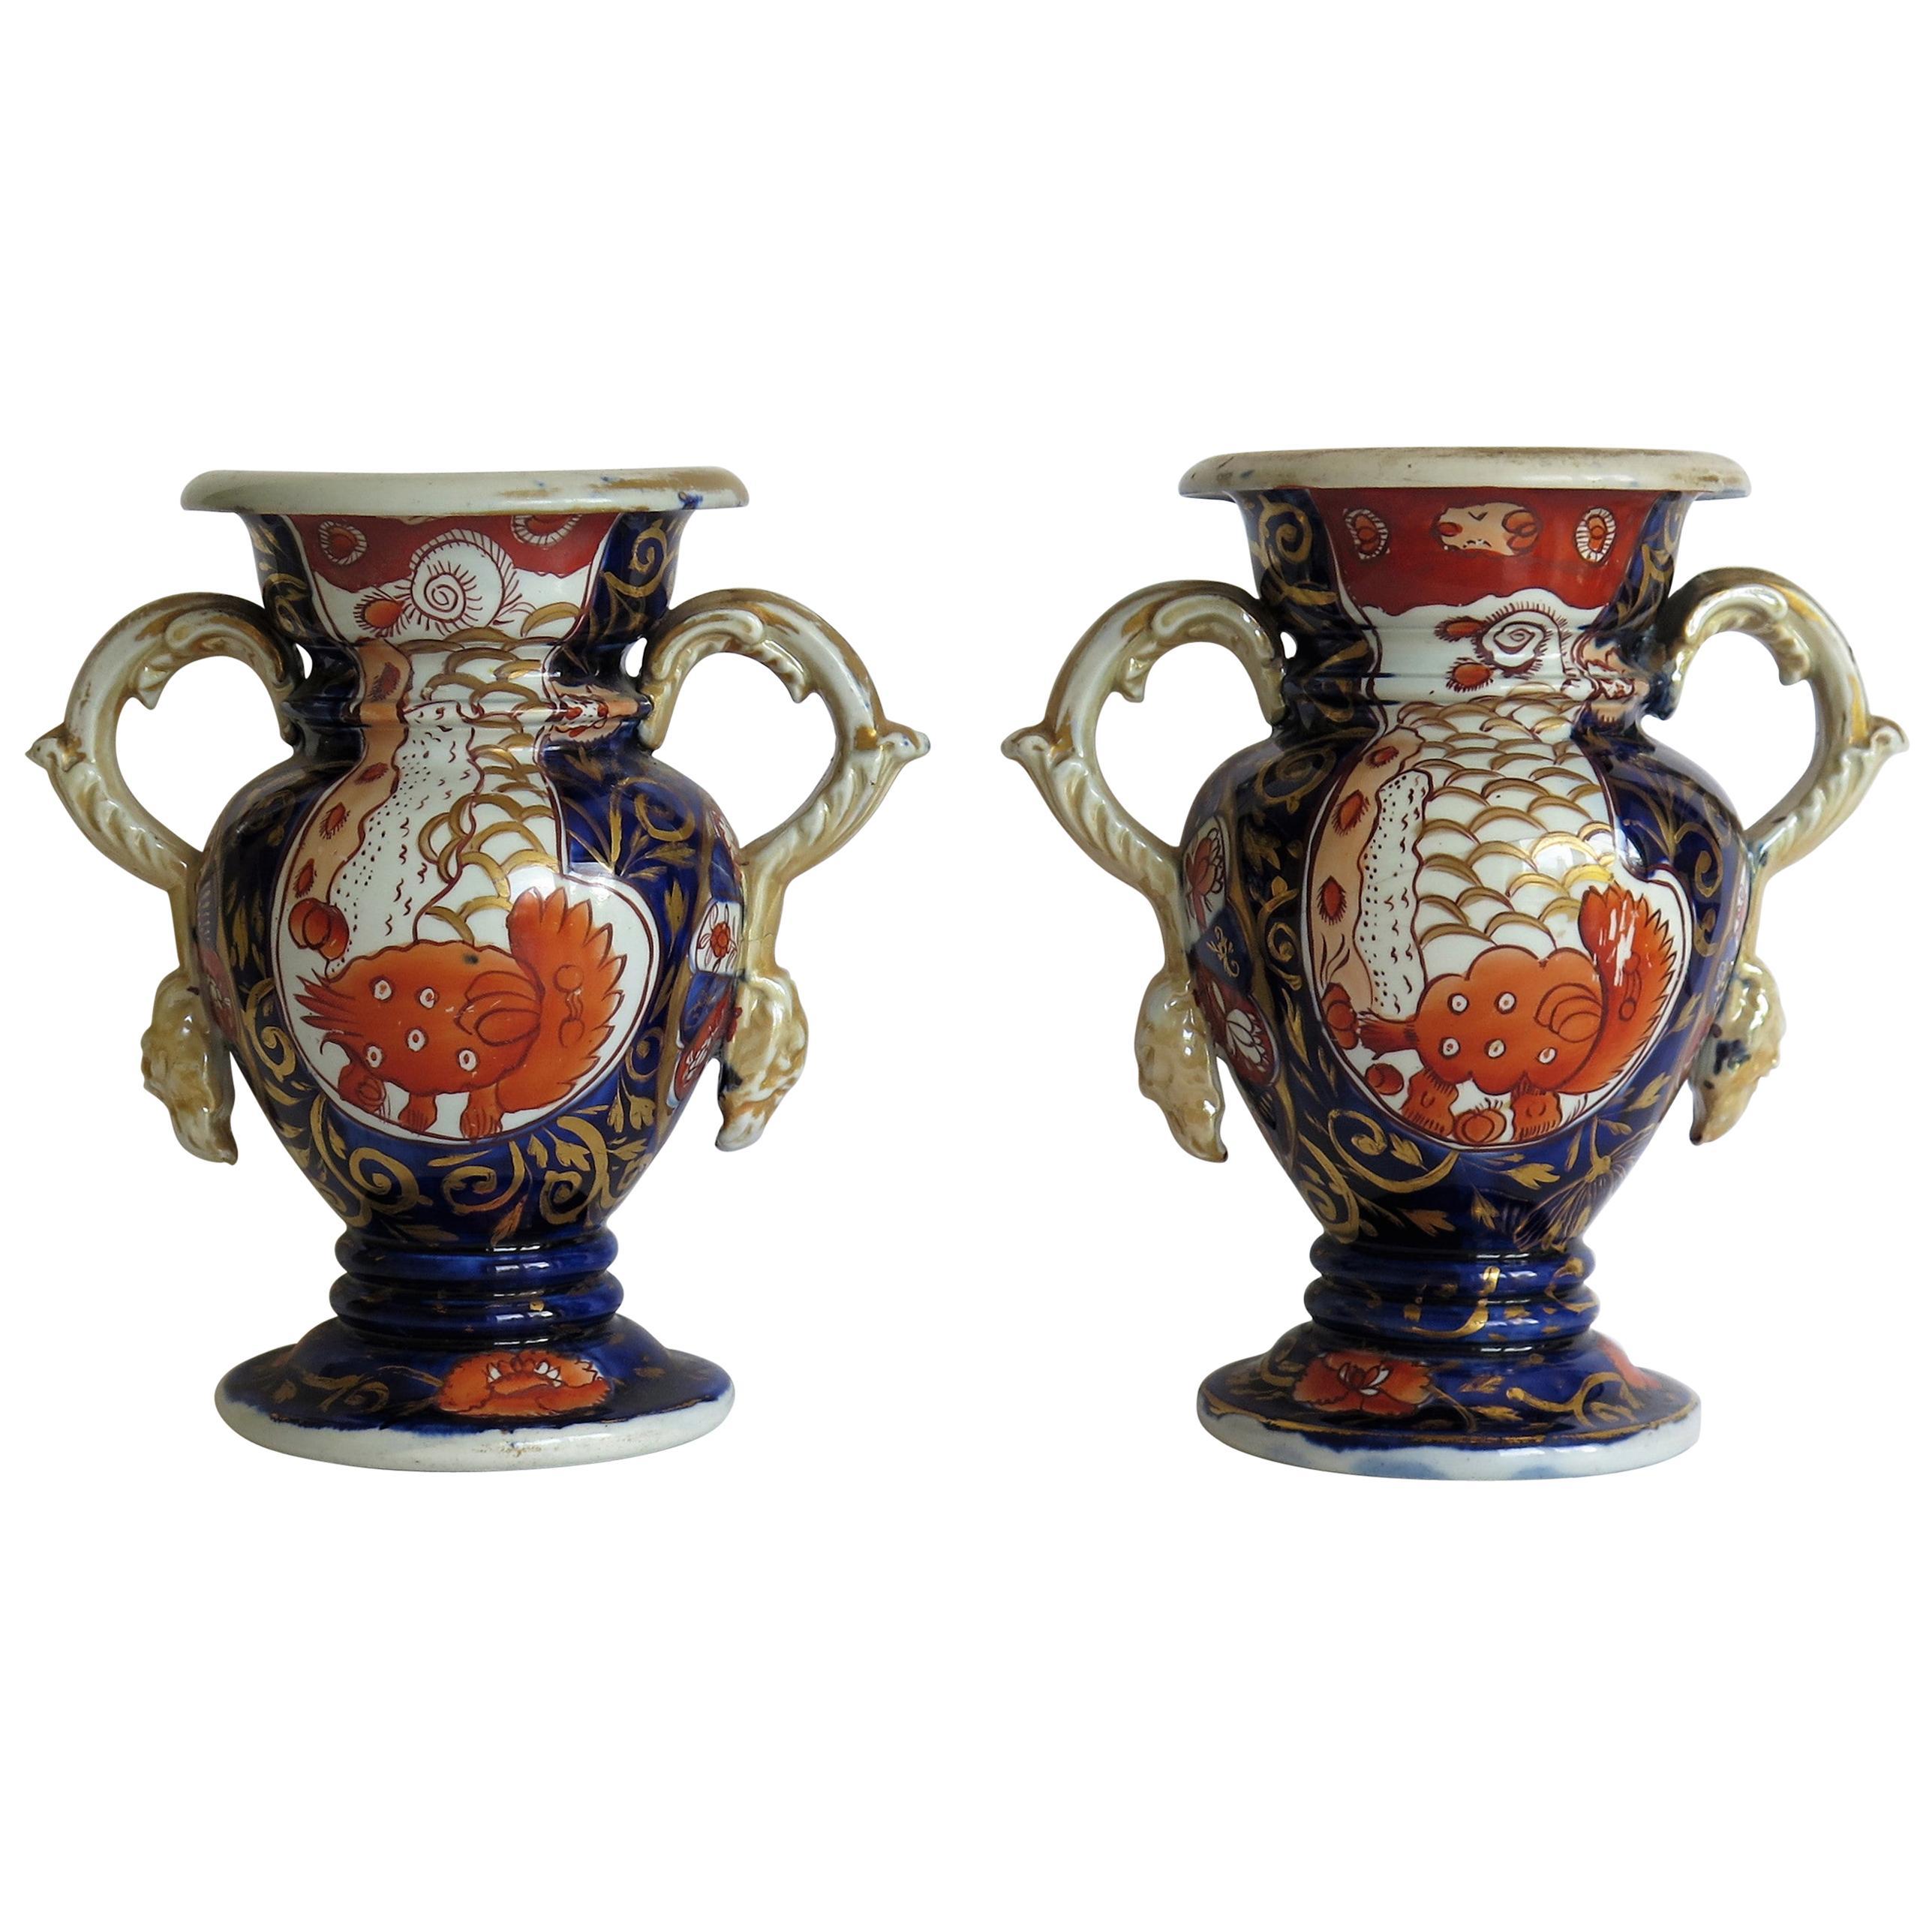 Rare Georgian PAIR of Mason's Ironstone Vases in Elephant Foot Pattern, Ca 1820